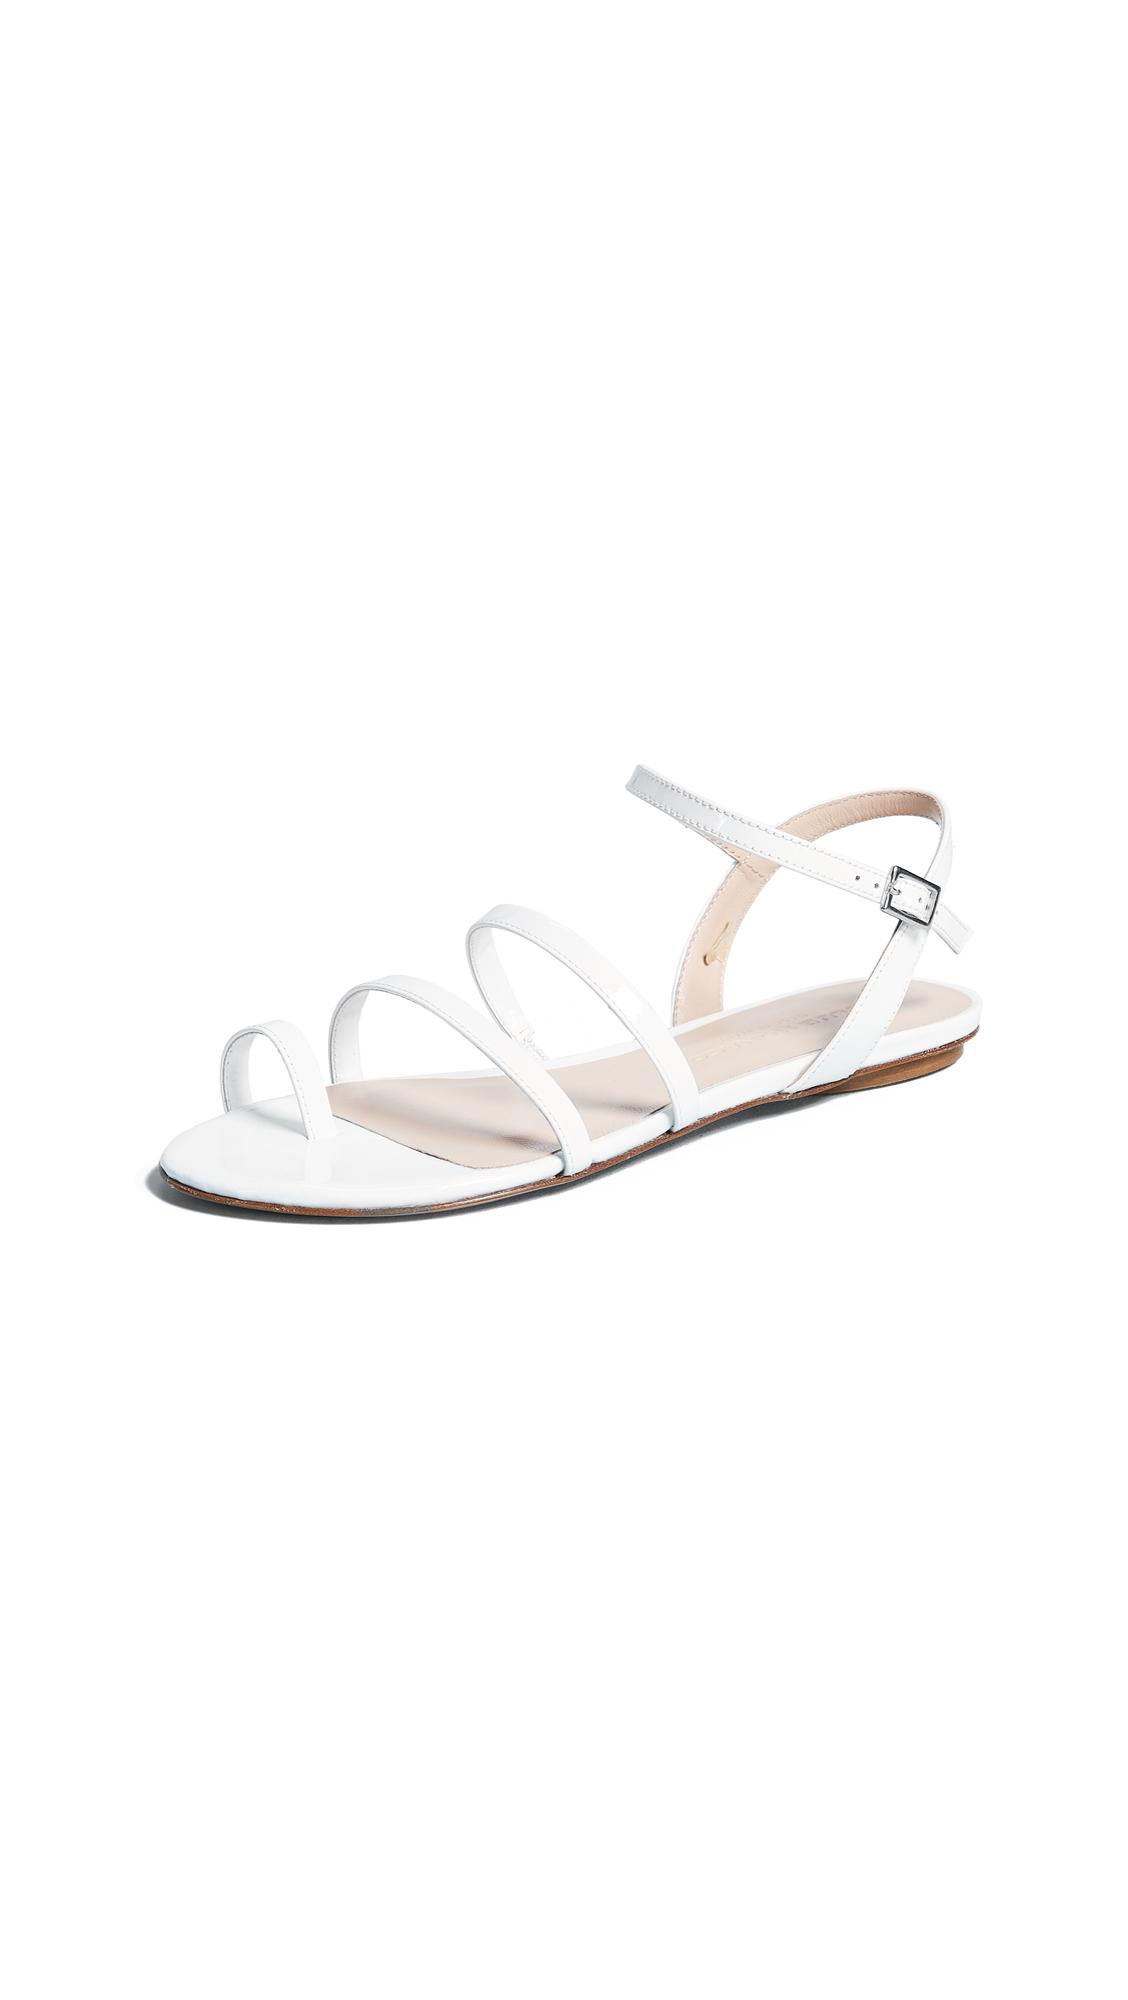 Club Monaco Akinya Sandals - White